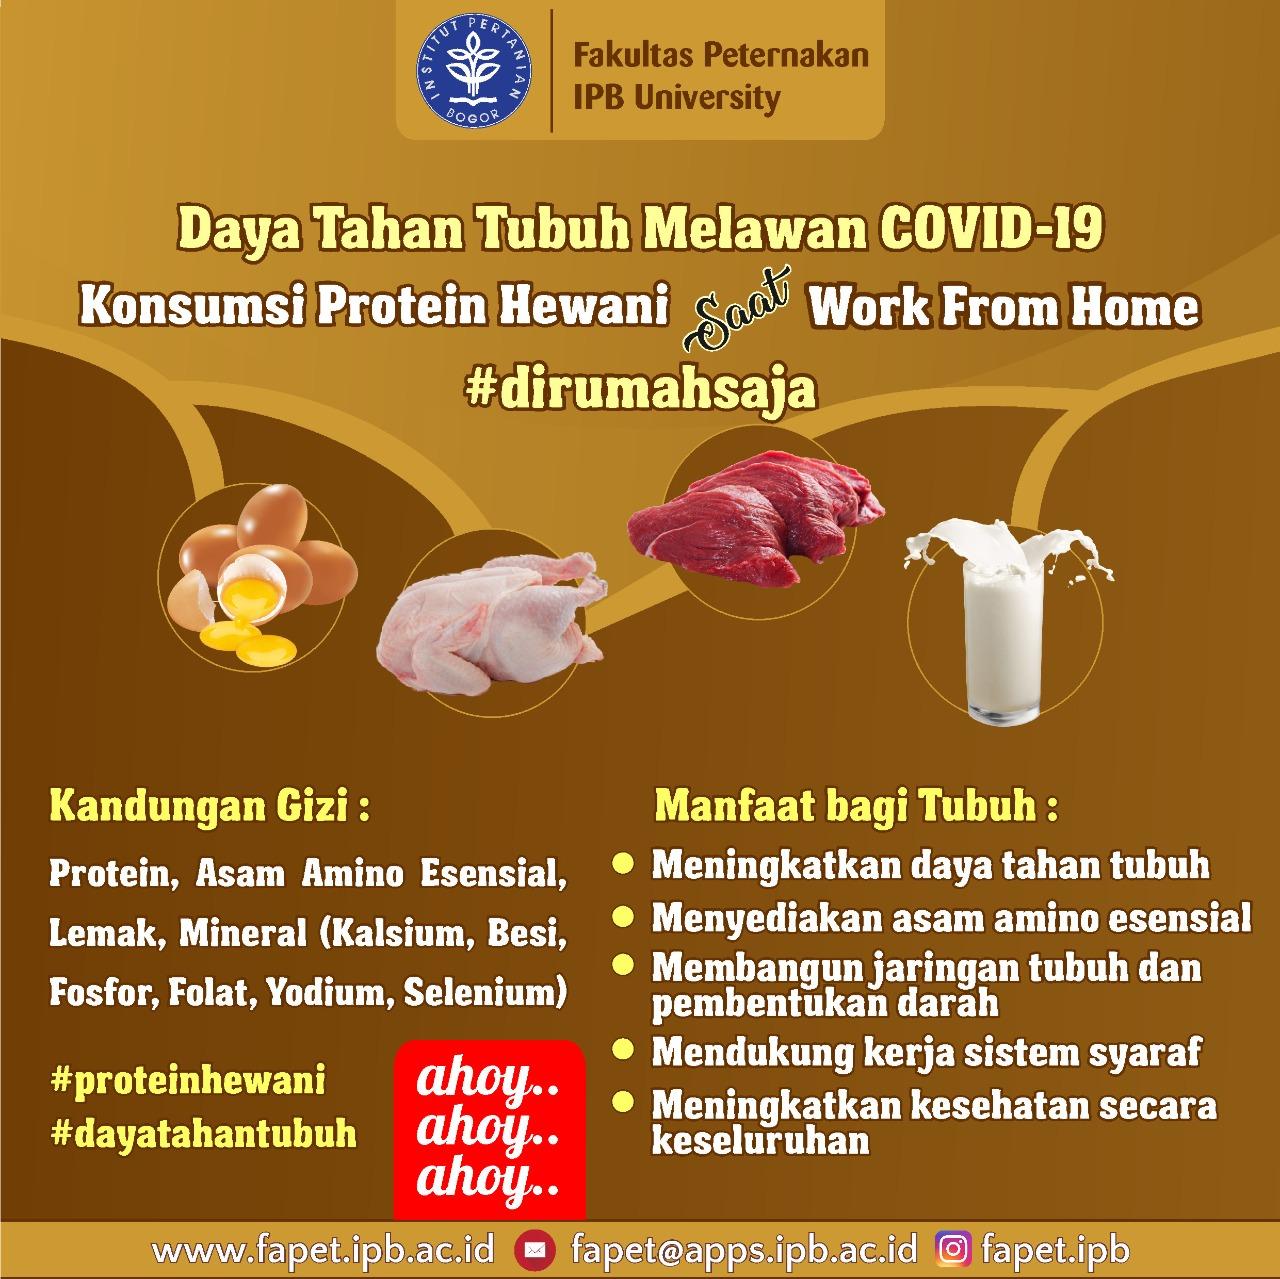 Konsumsi_protein_Hewani